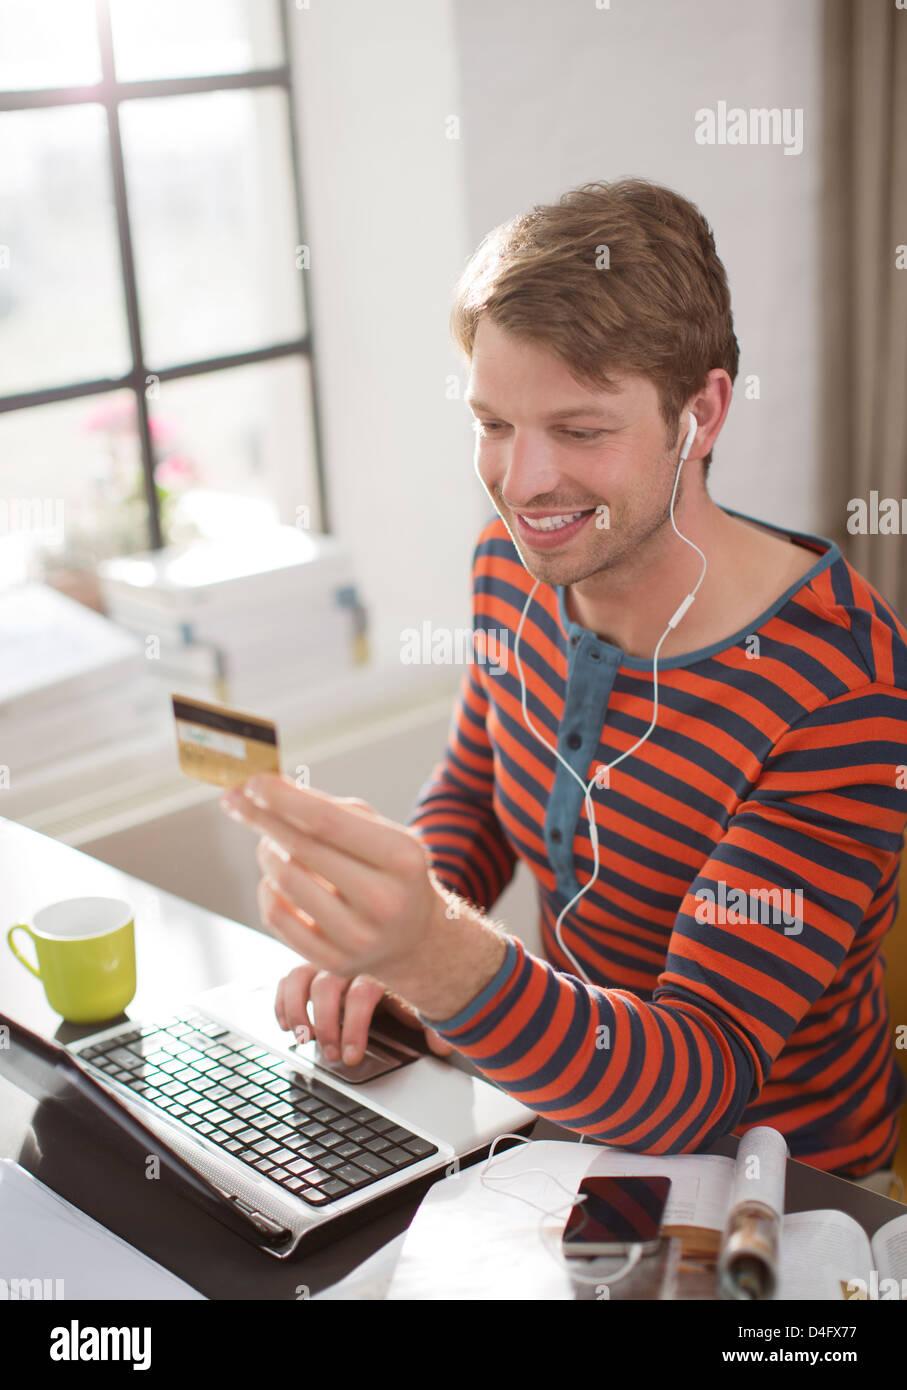 Man in headphones shopping on laptop - Stock Image